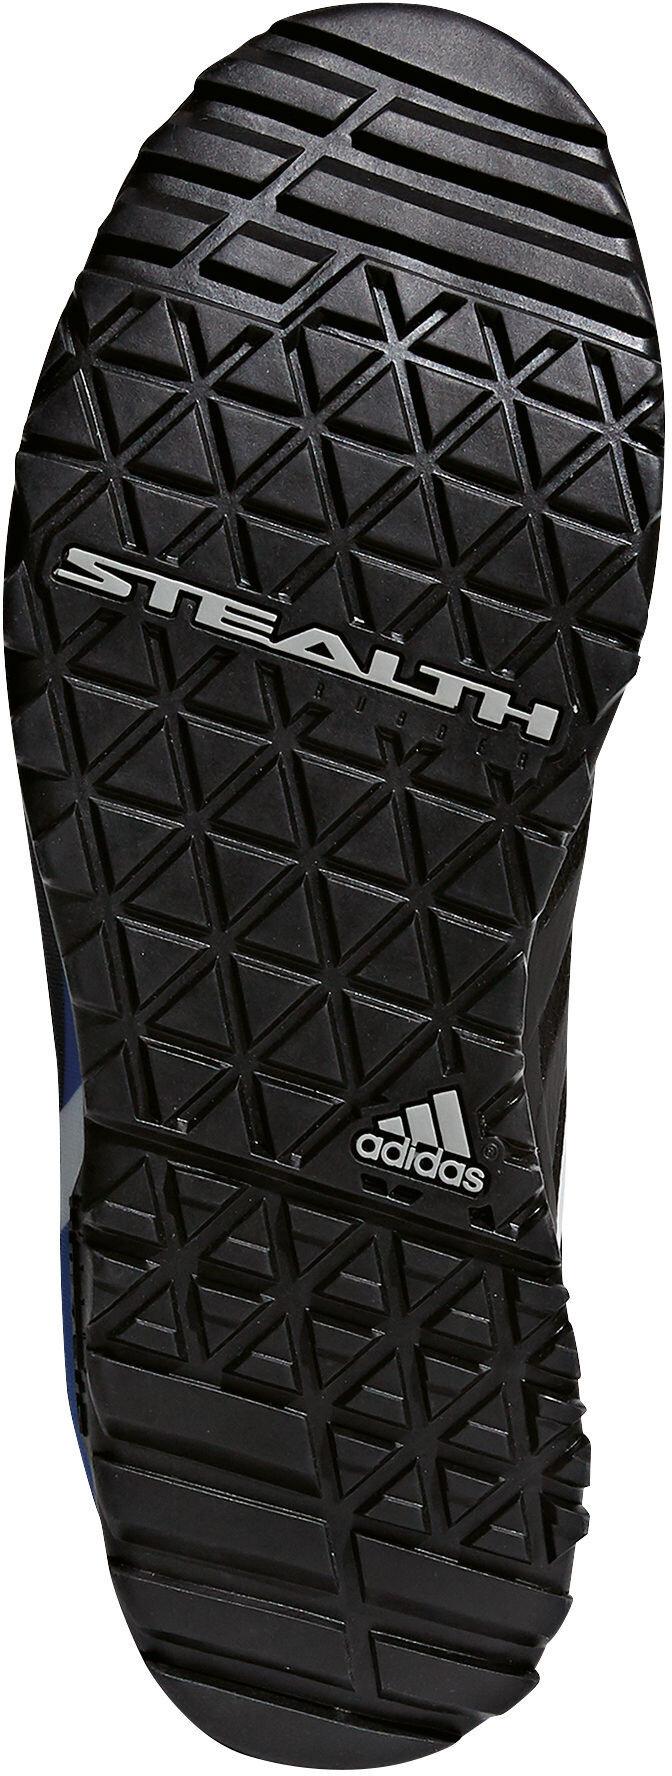 adidas TERREX Trail Cross Protect schoenen Heren blauwzwart